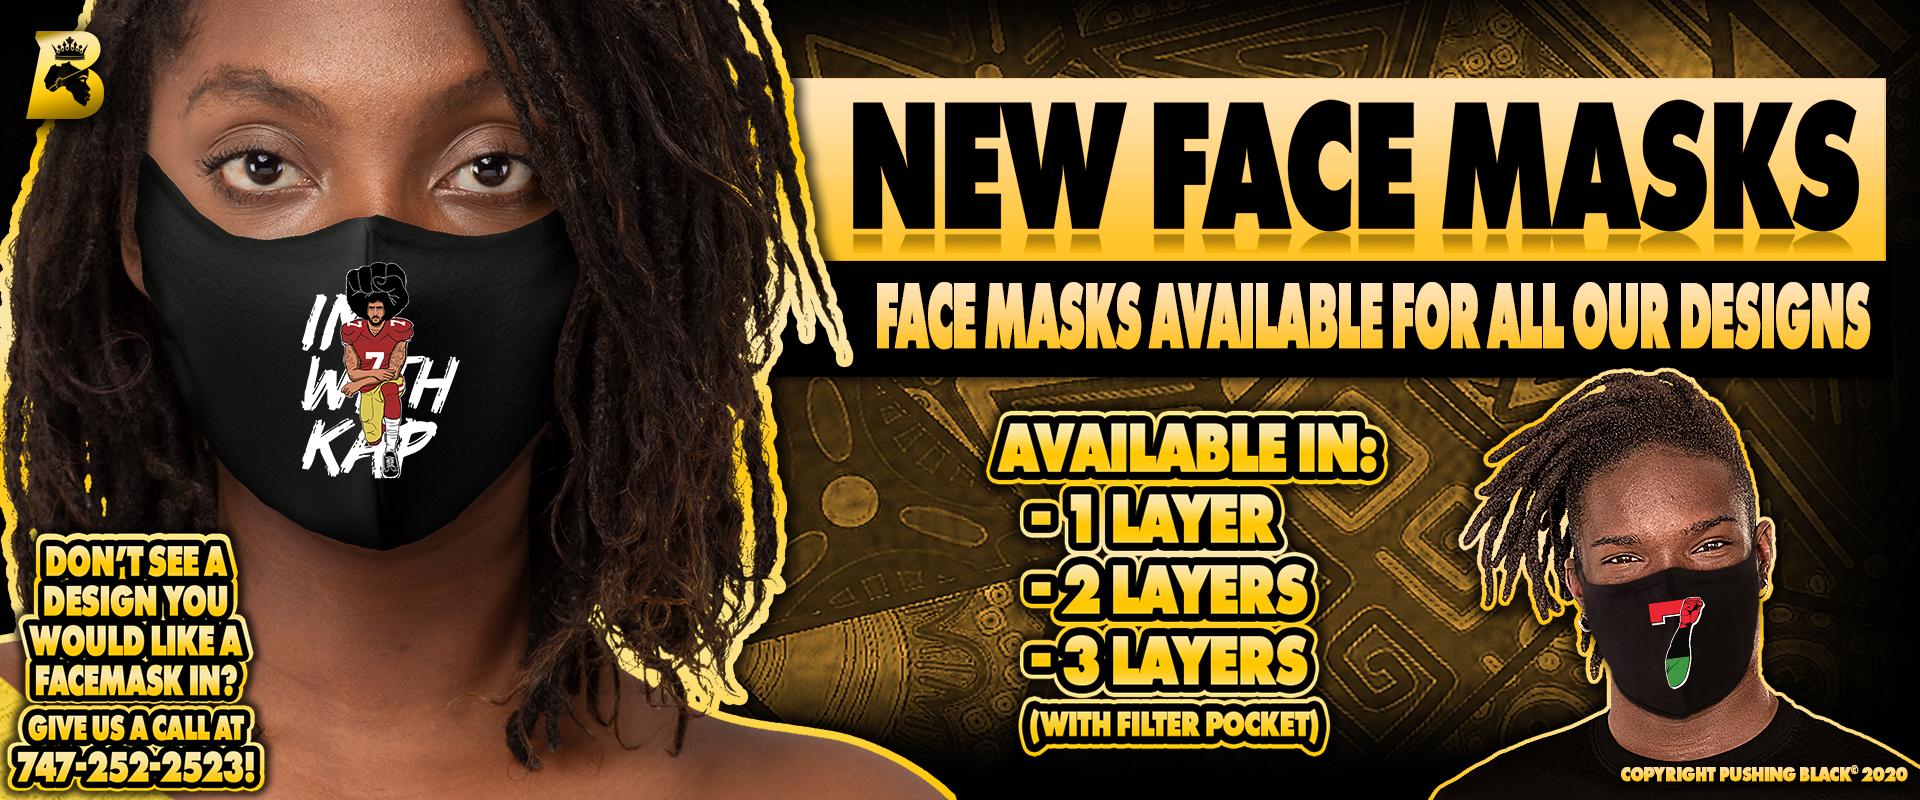 facemaskshomepage2.png